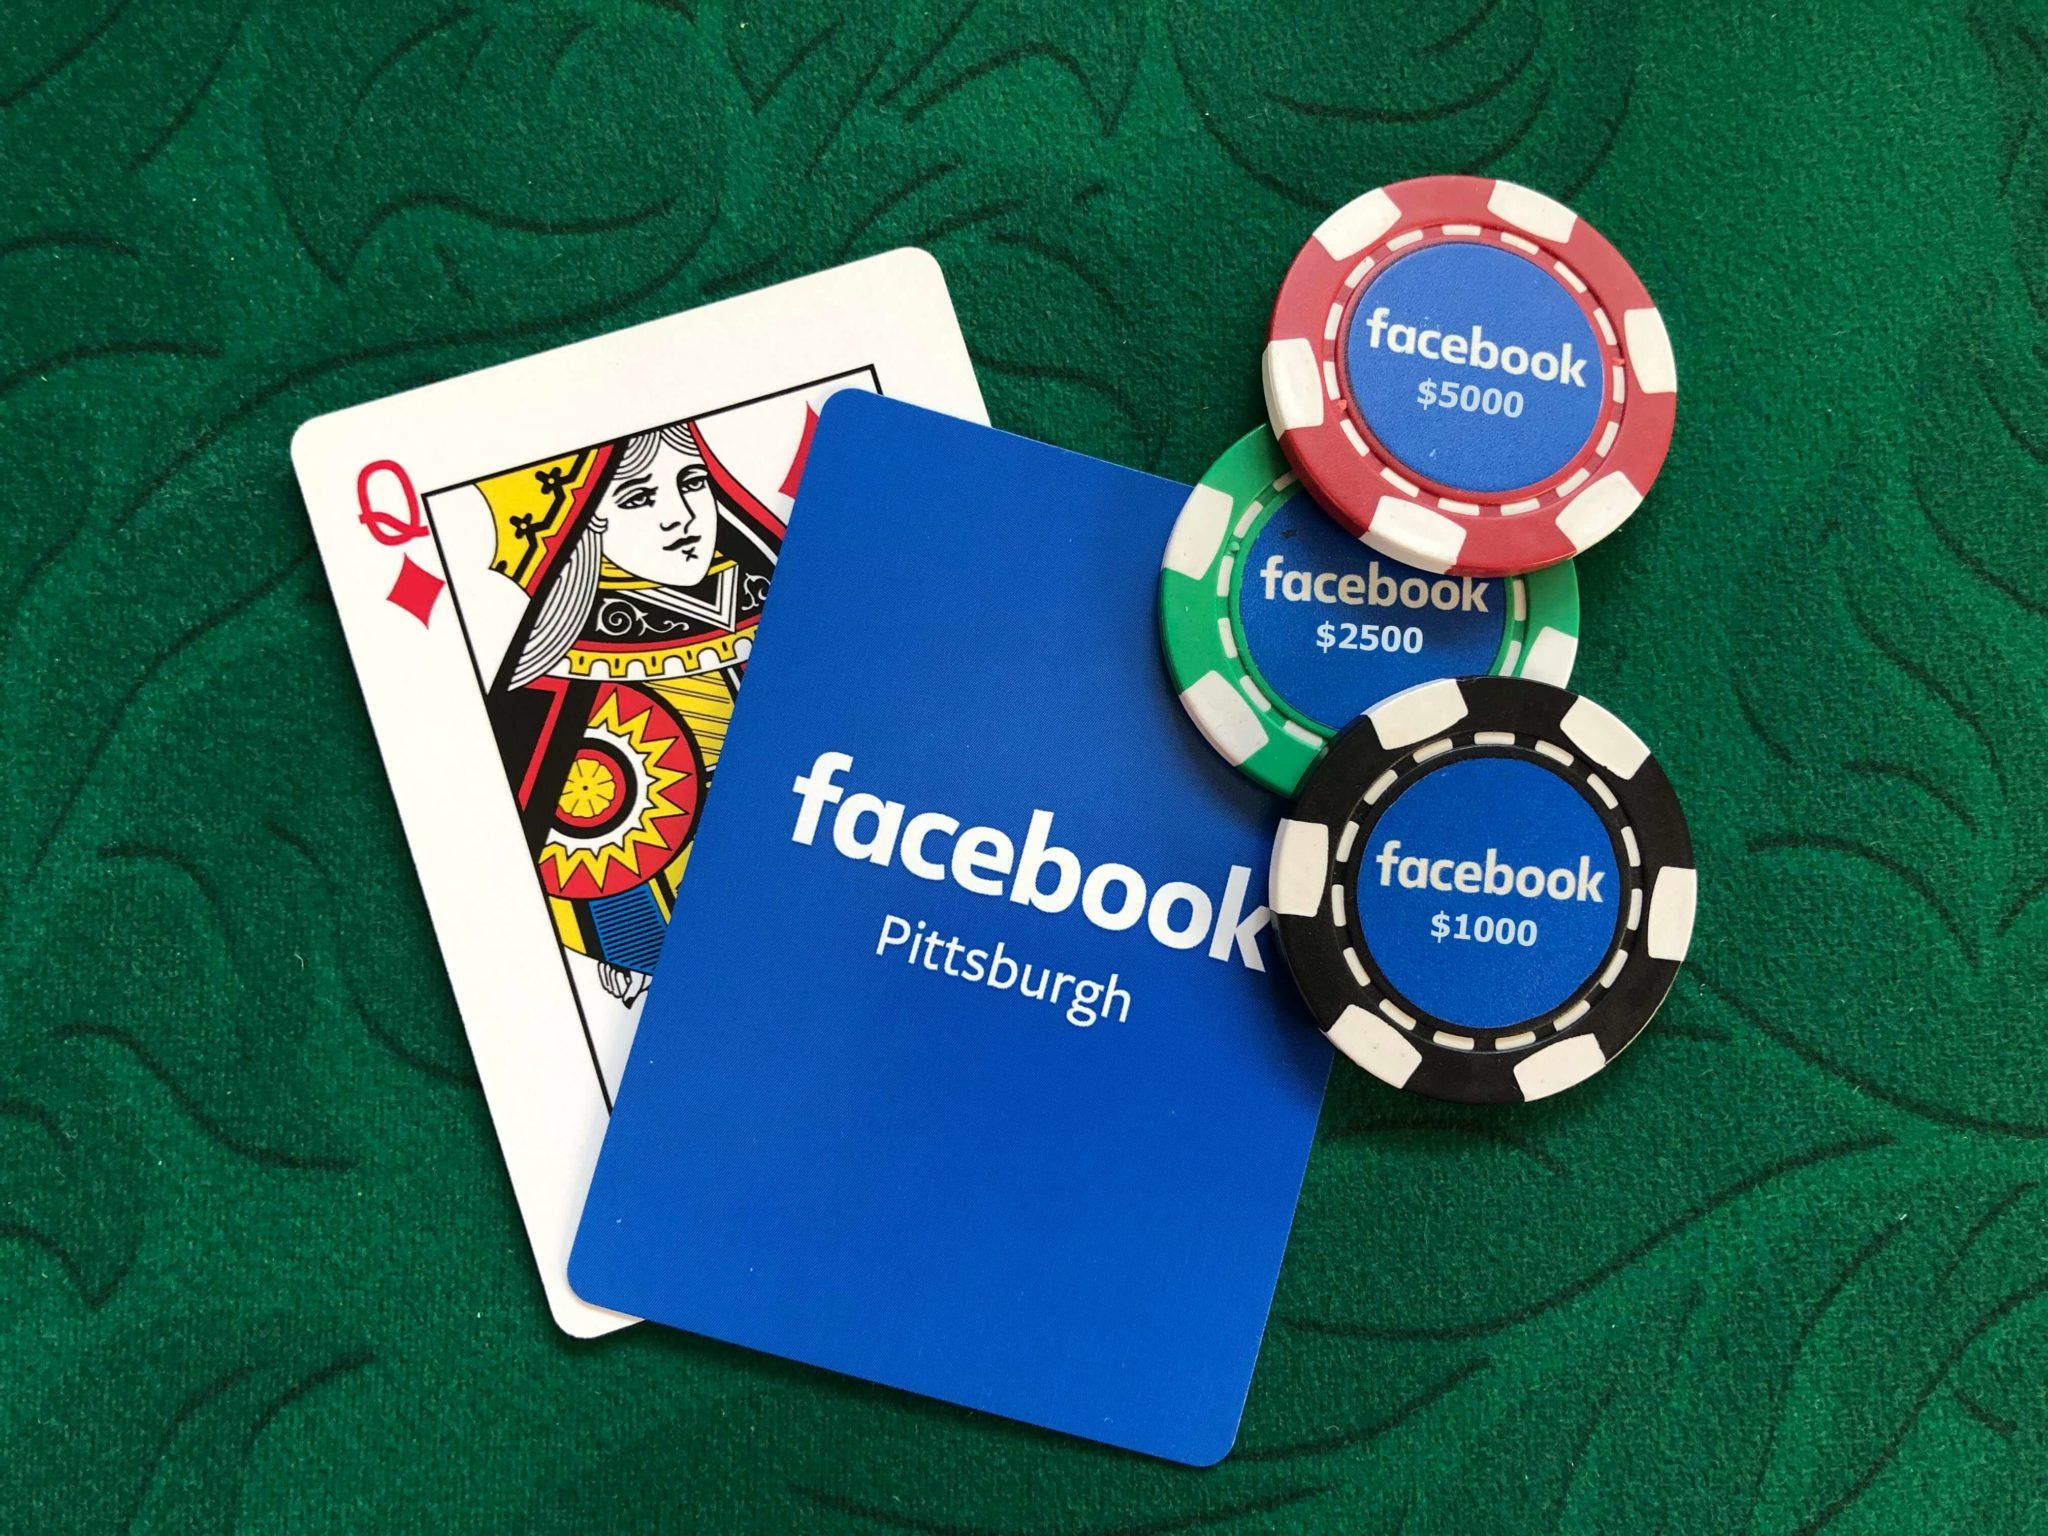 Casino Chip Vouchers